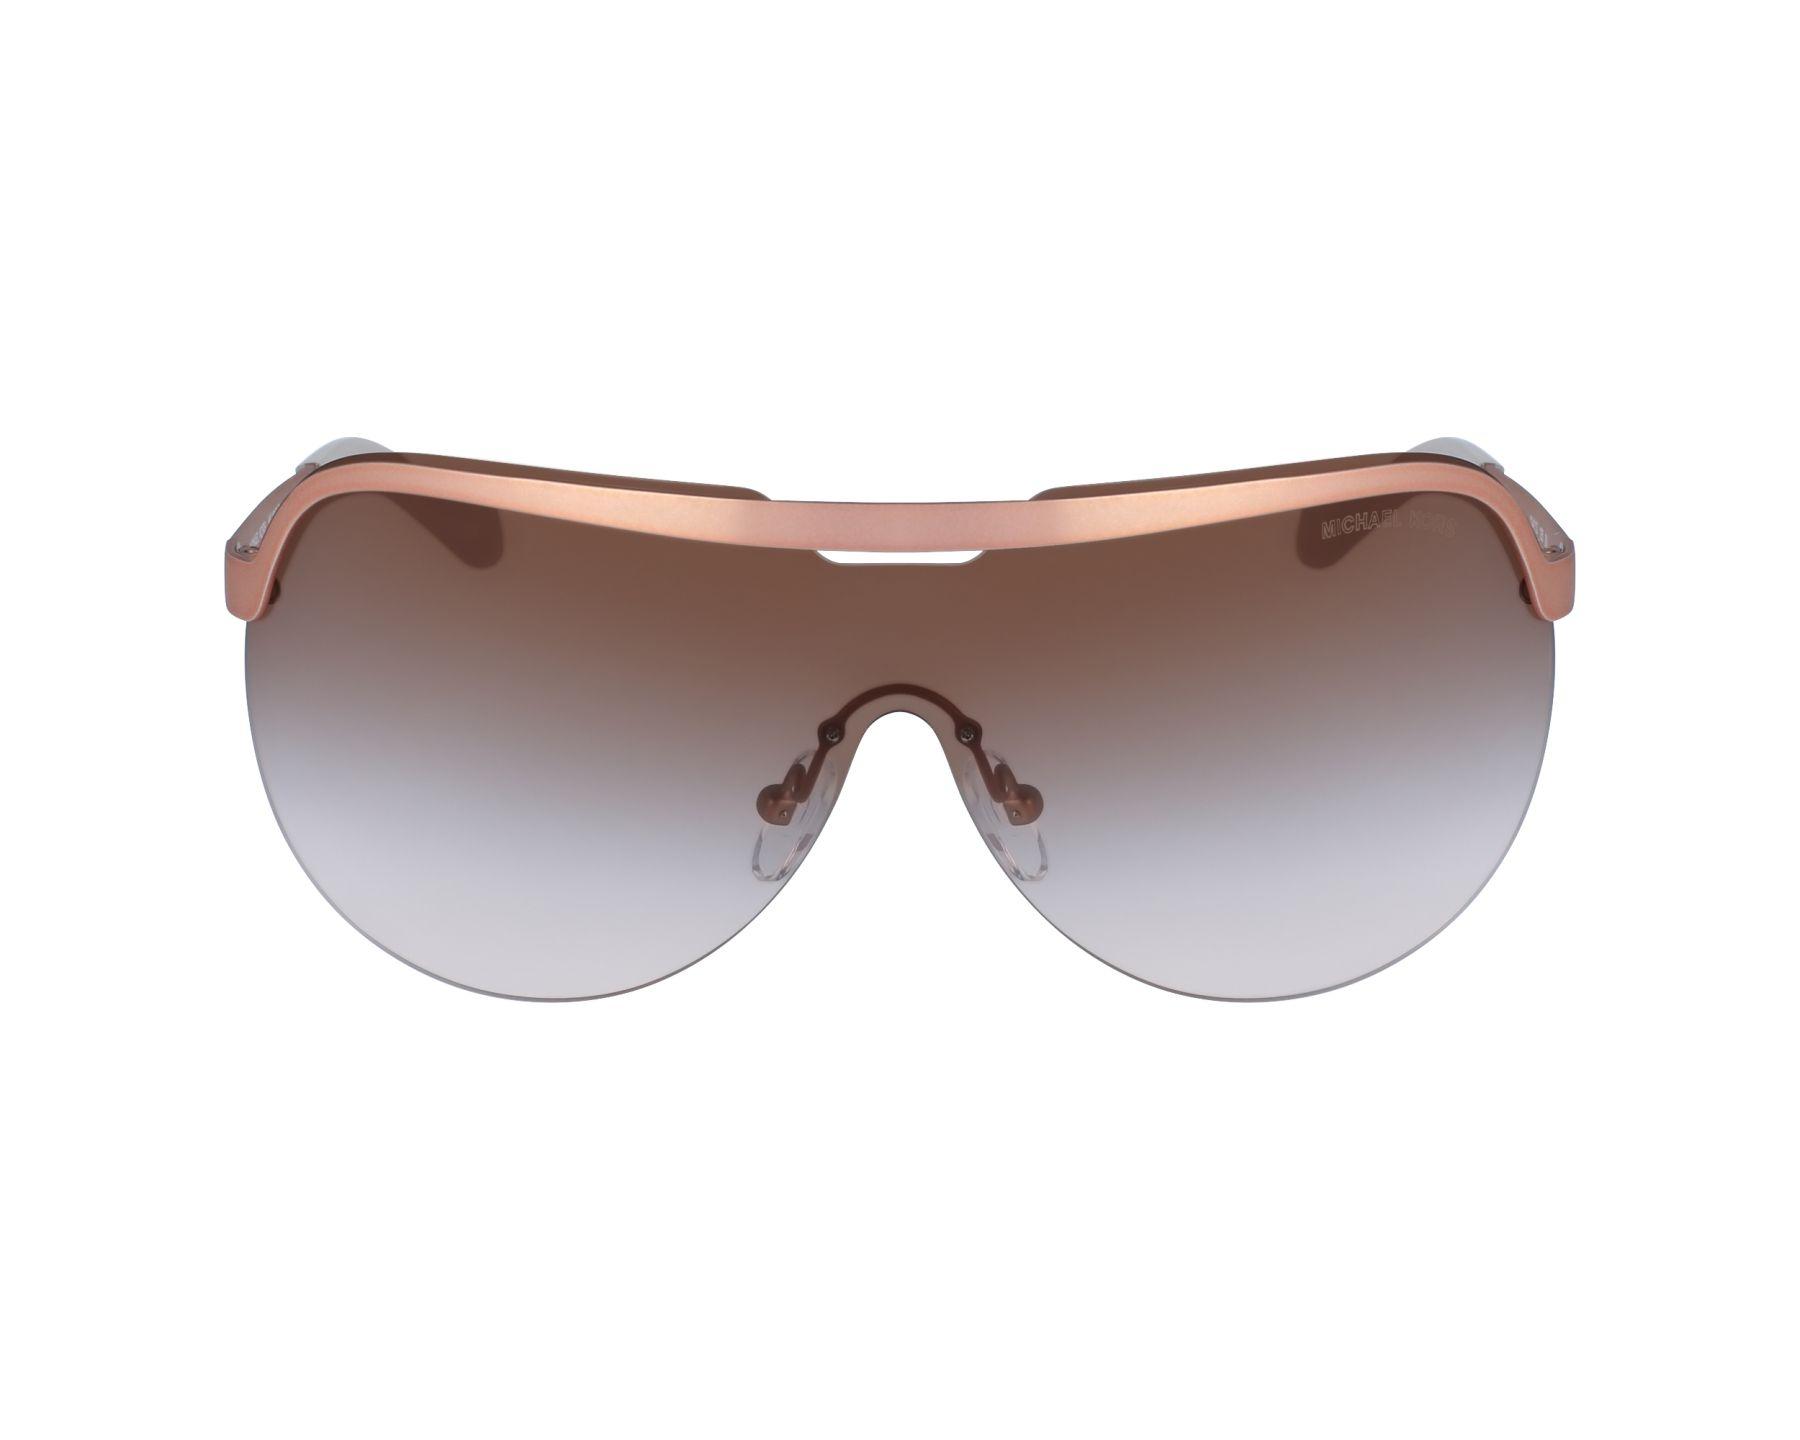 Michael Kors Sunglasses Purple with Brown Lenses MK-1017 114113 ...